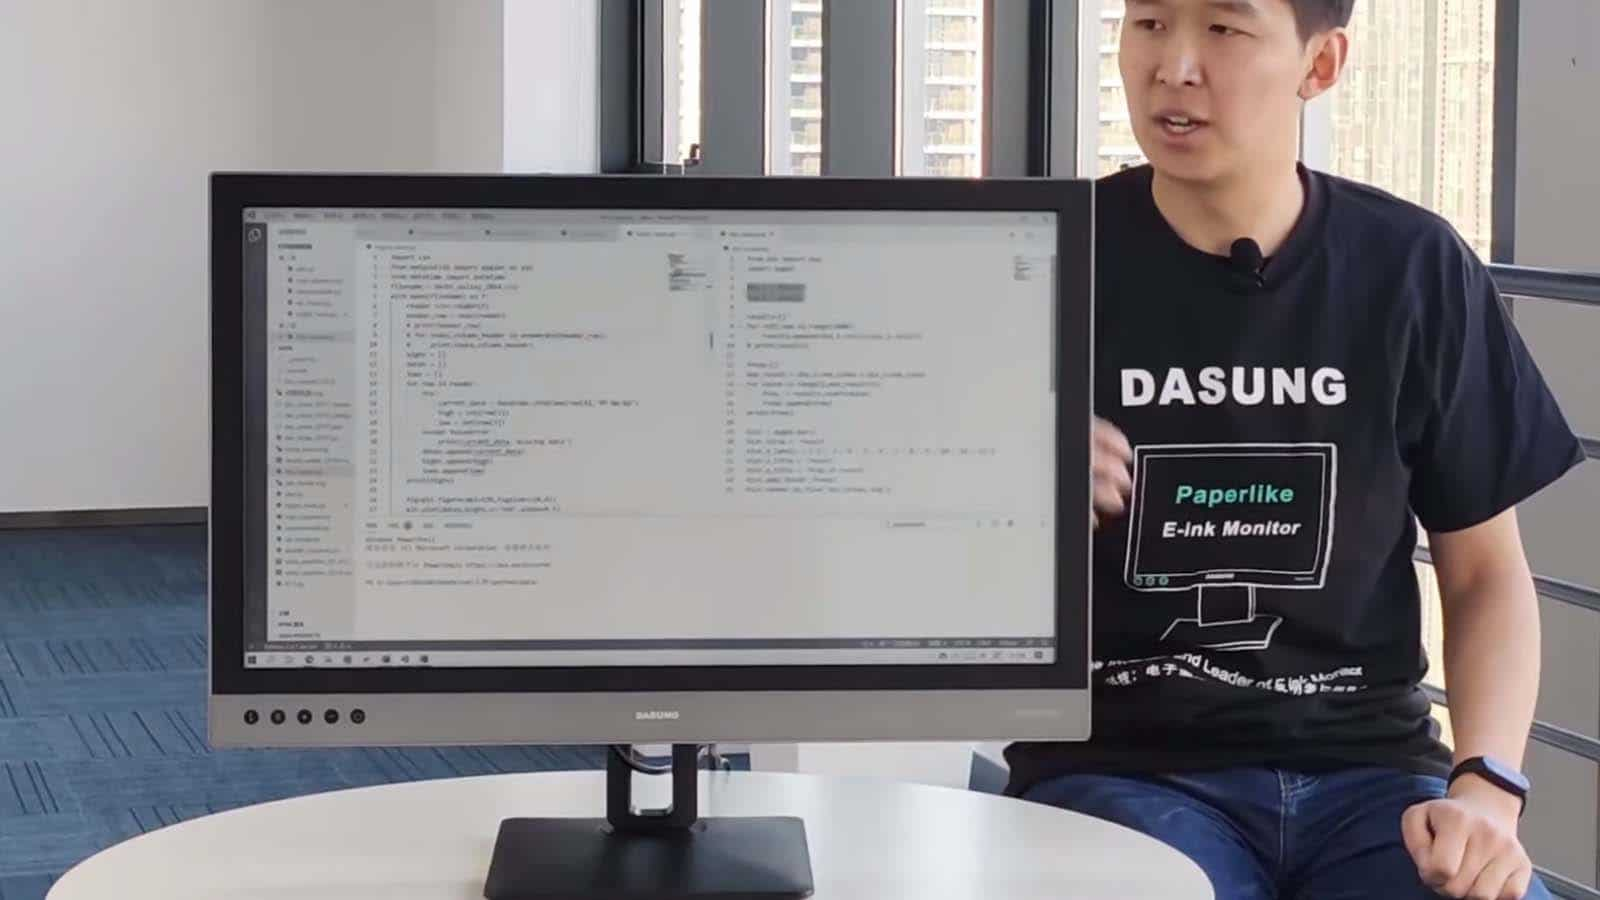 dasung e-ink monitor